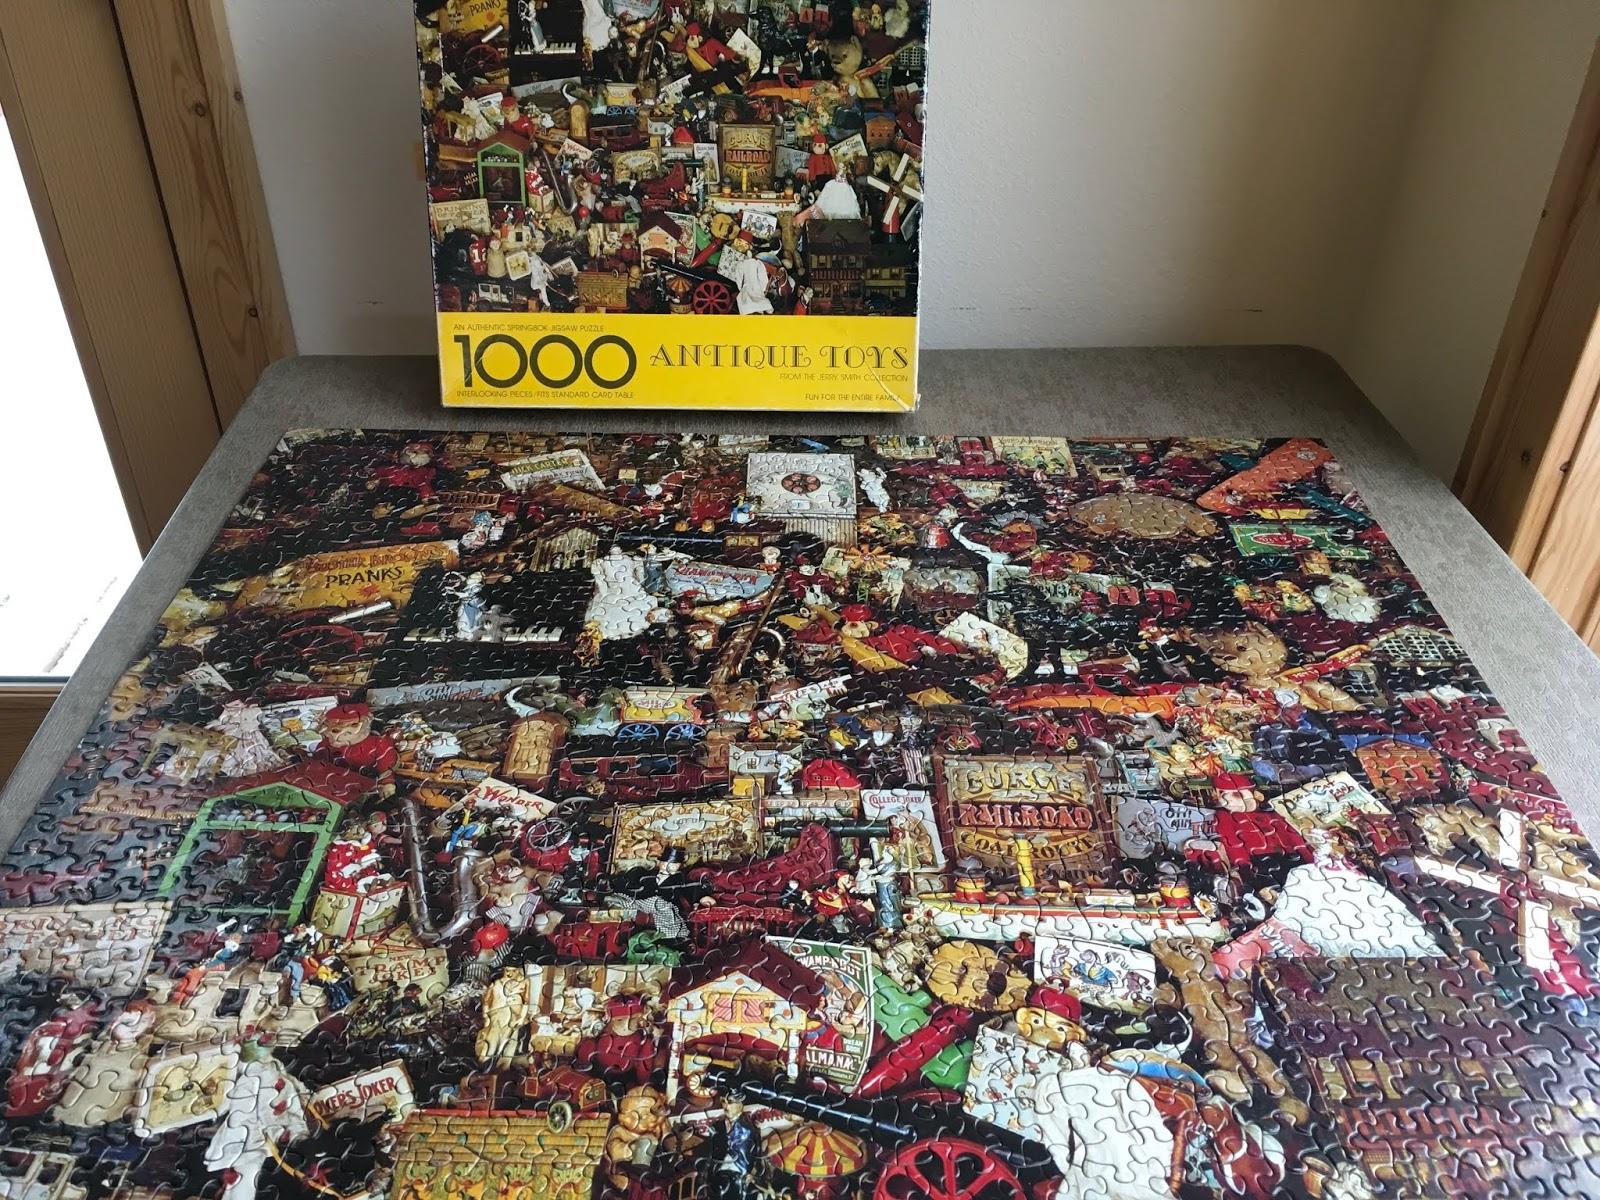 Too many puzzles!